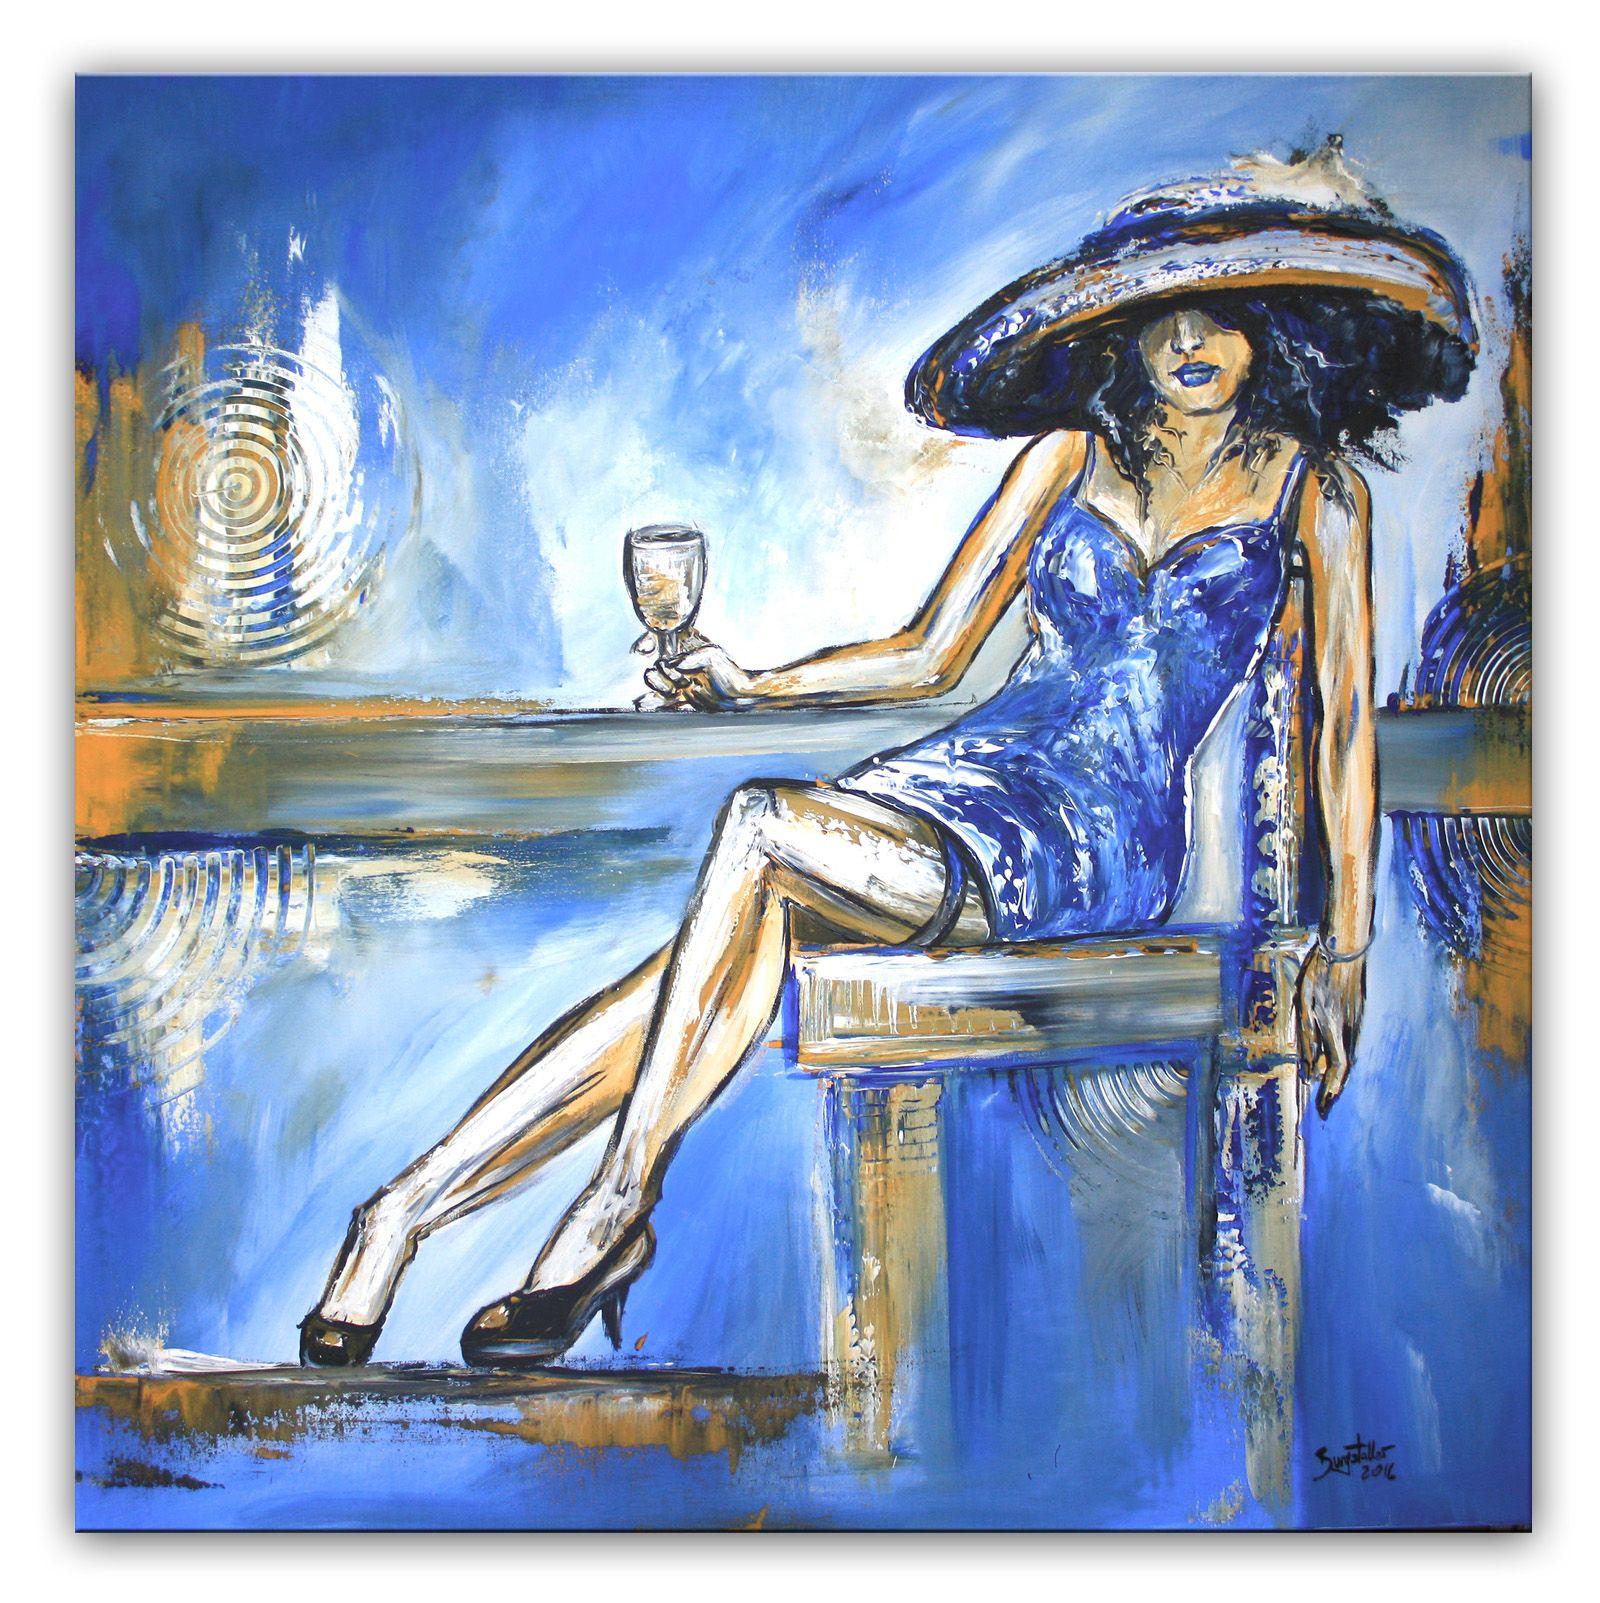 Noch mehr - Boheme Bild Frau handgemalt - Modernes Wandbild aus dem ...